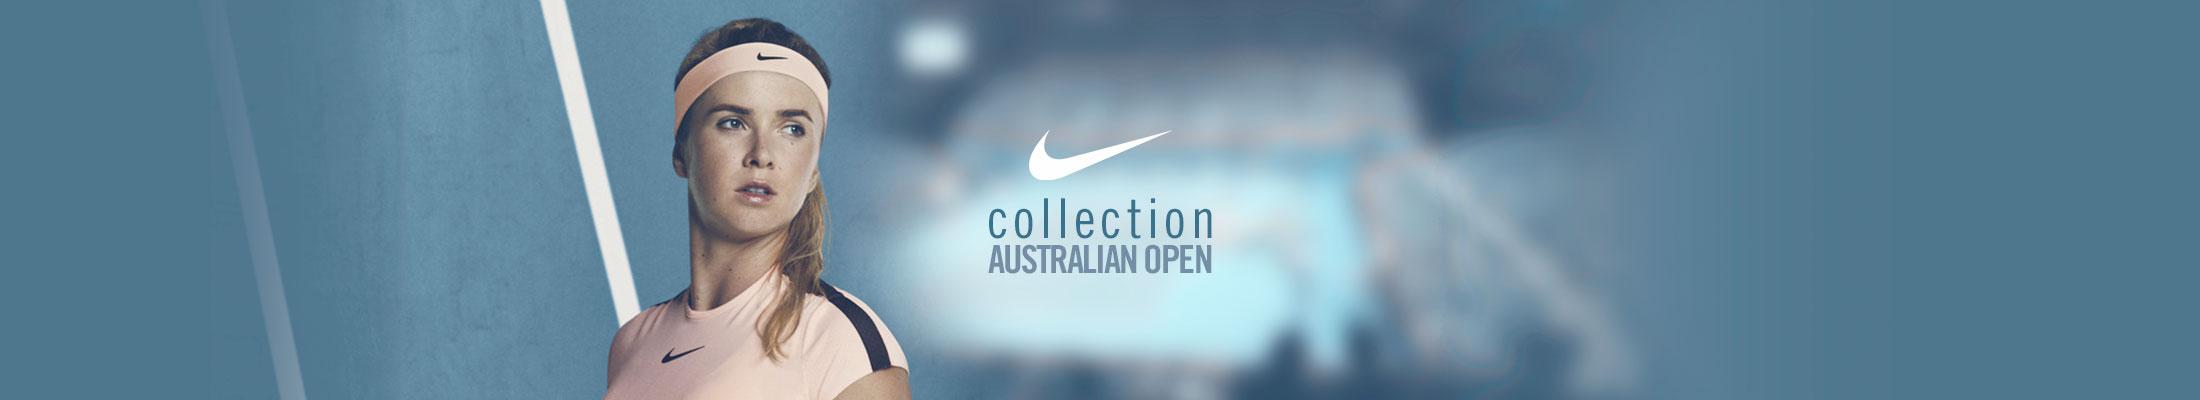 Nike Australian Open Collection 2018